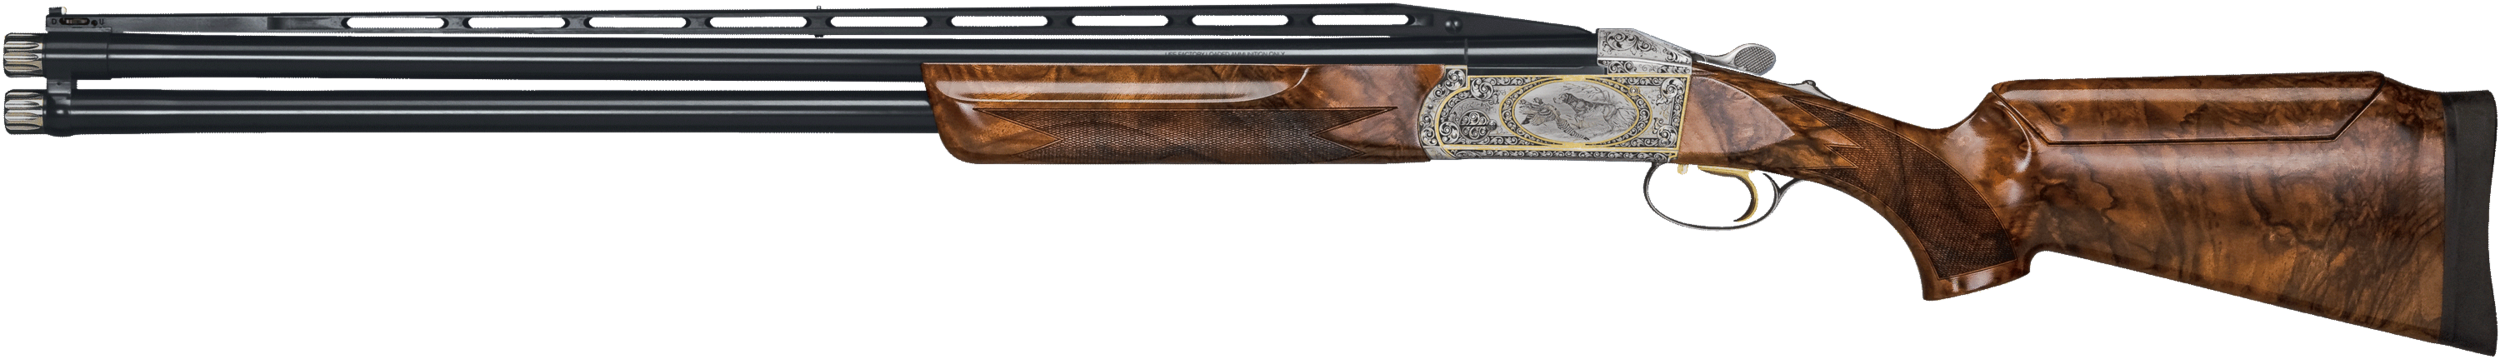 Krieghoff K-80 Pro Trap